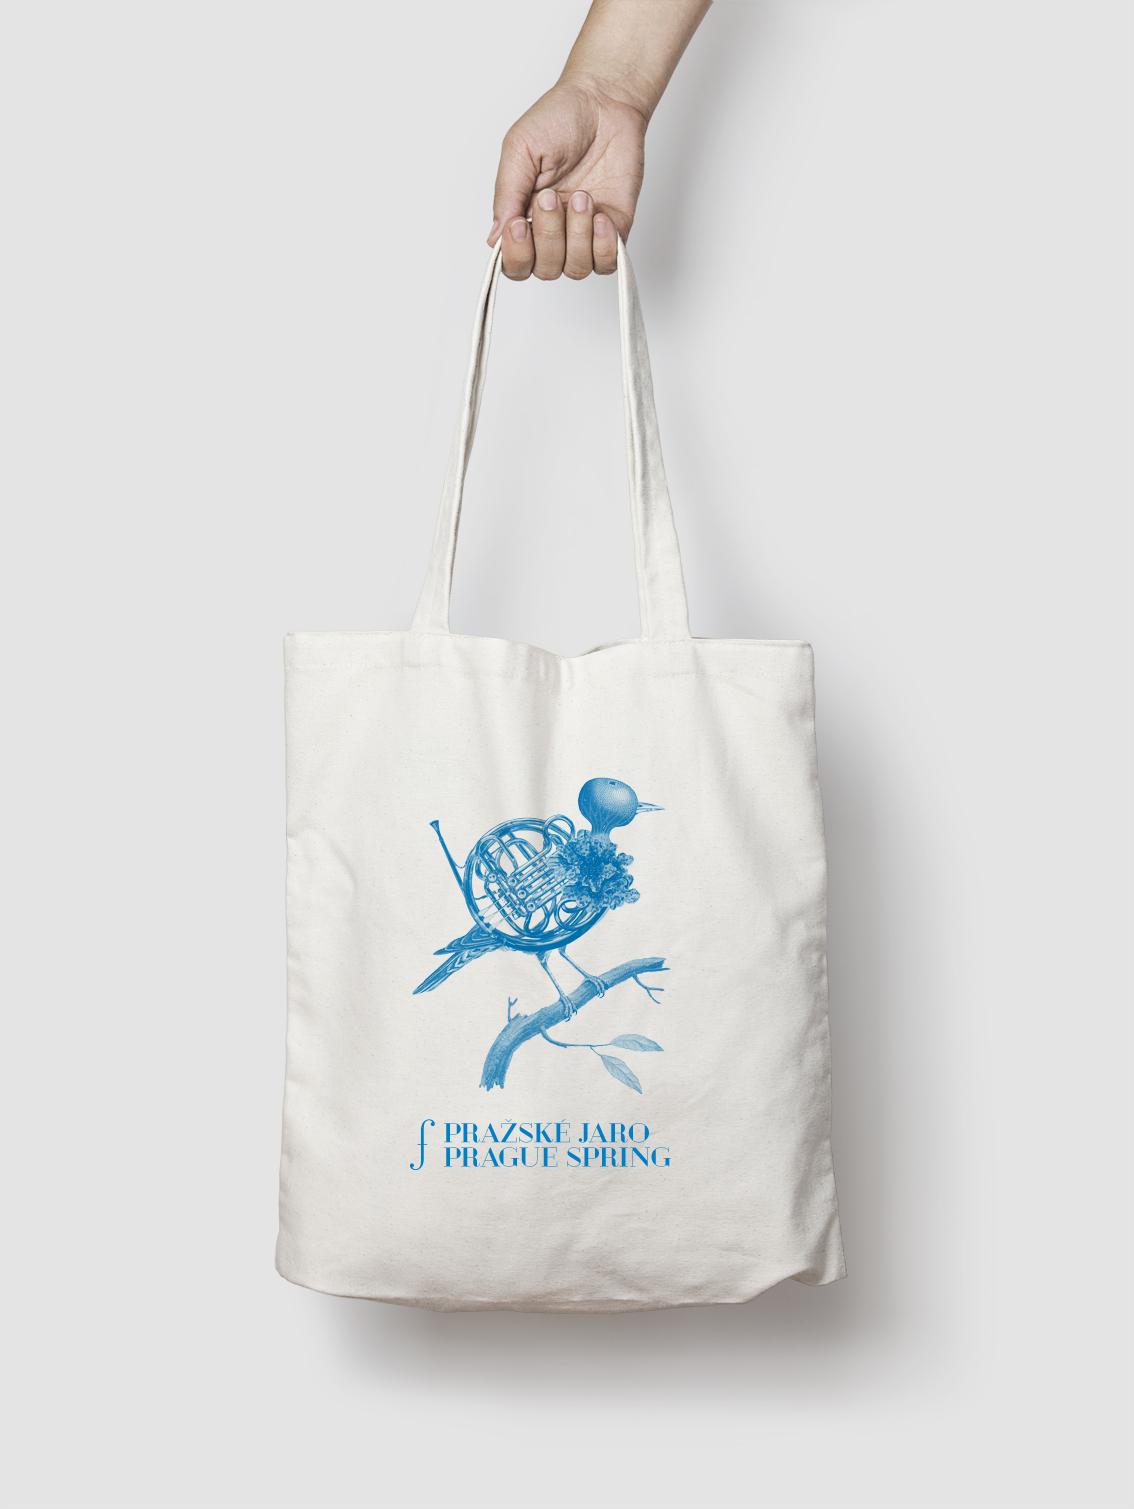 Pražské jaro: taška